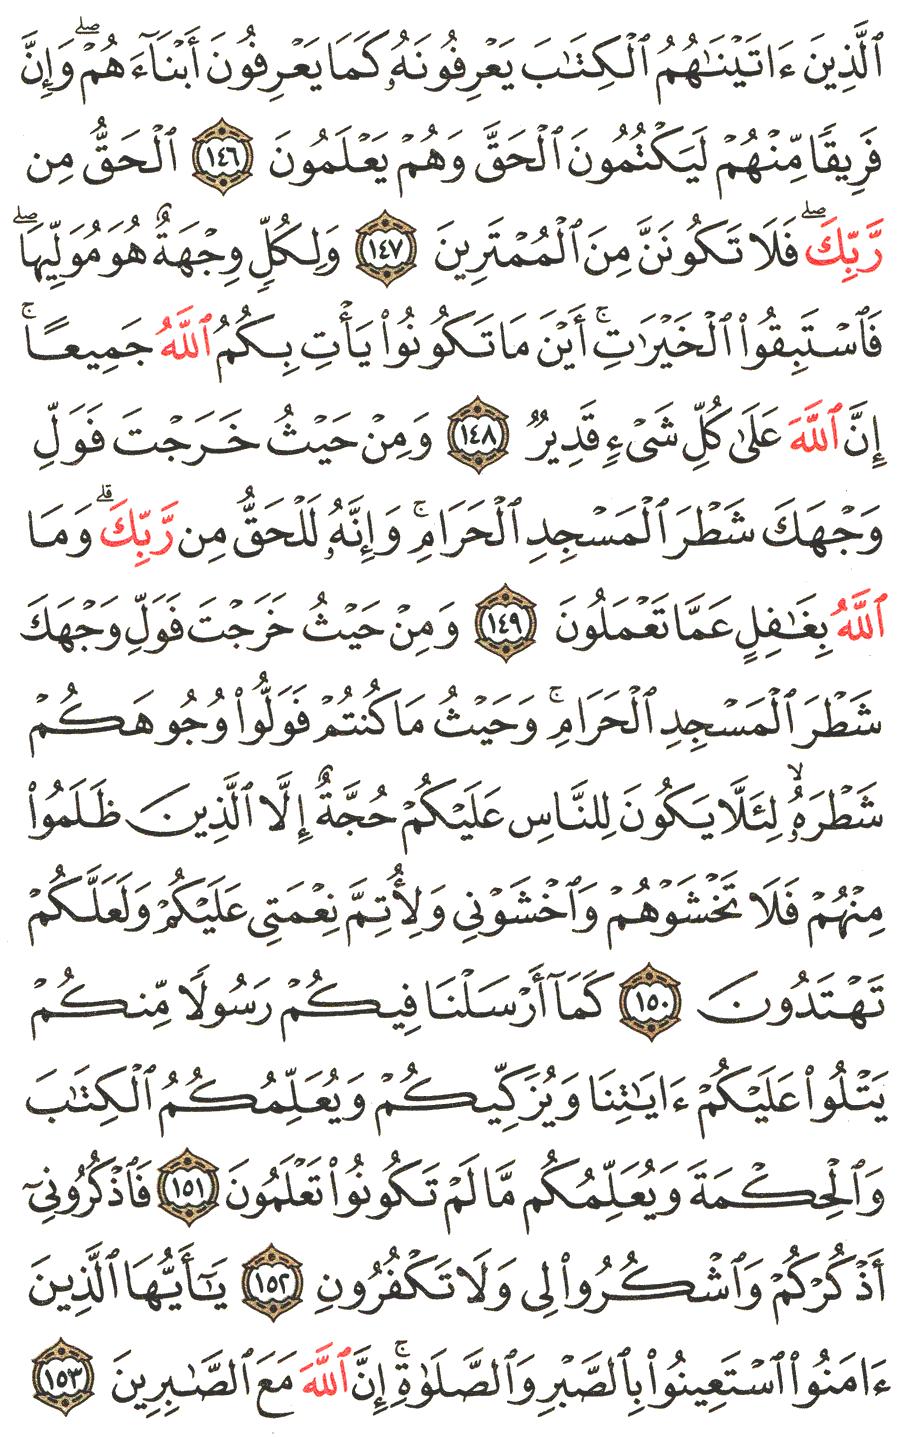 Albaqarah 148 : albaqarah, Surah, Al-Baqarah, Hausa, Translation, Meaning